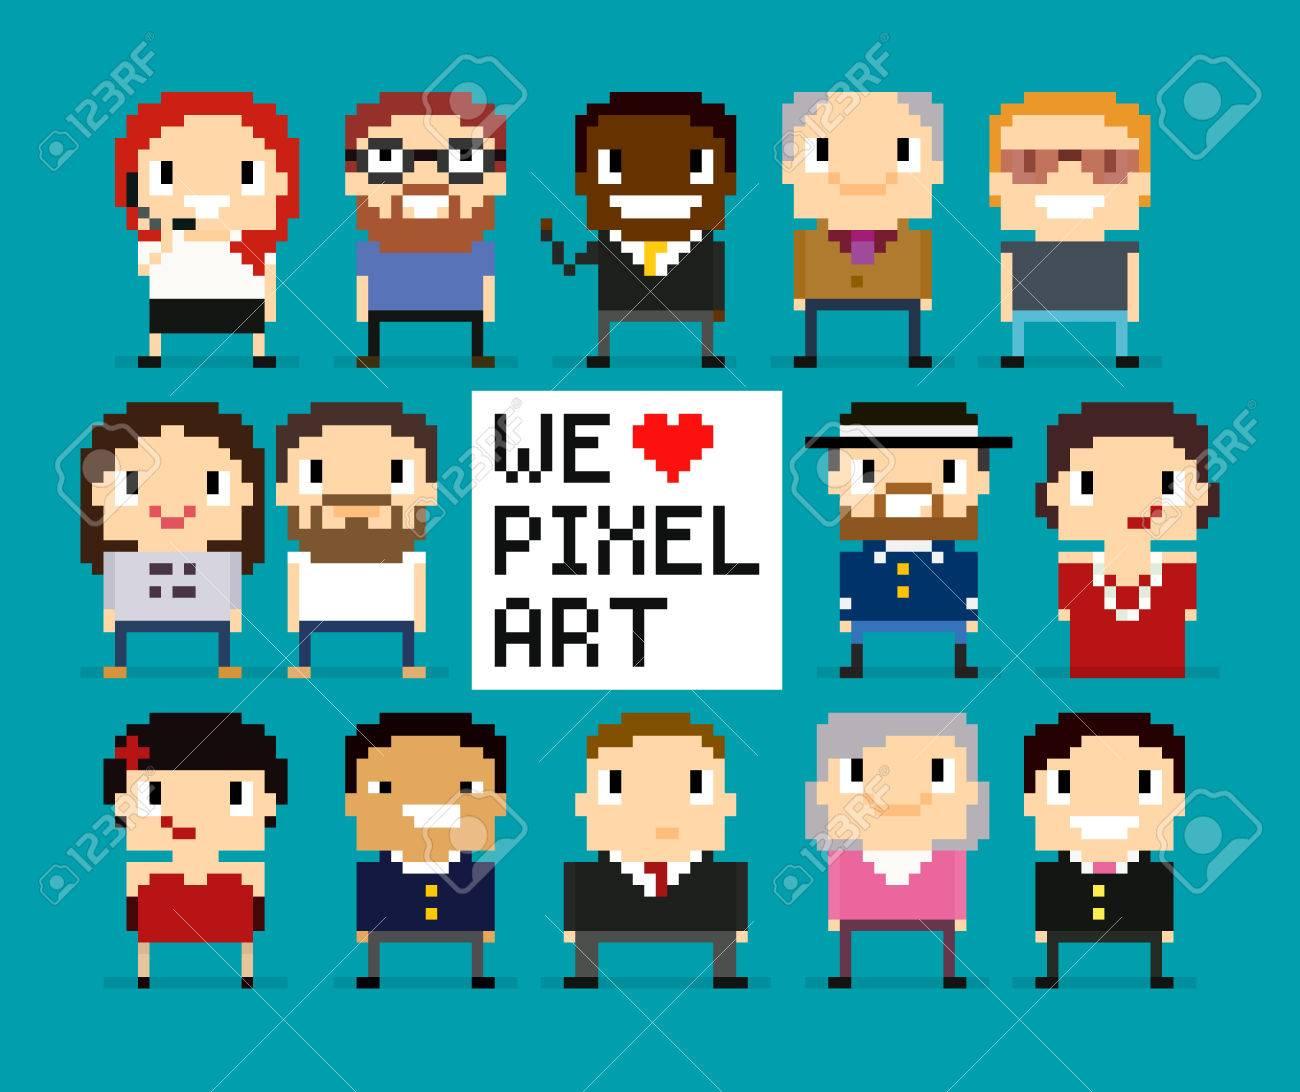 Diferentes Personajes Pixel Art, 8 Personas Bits, Los Trabajadores ...